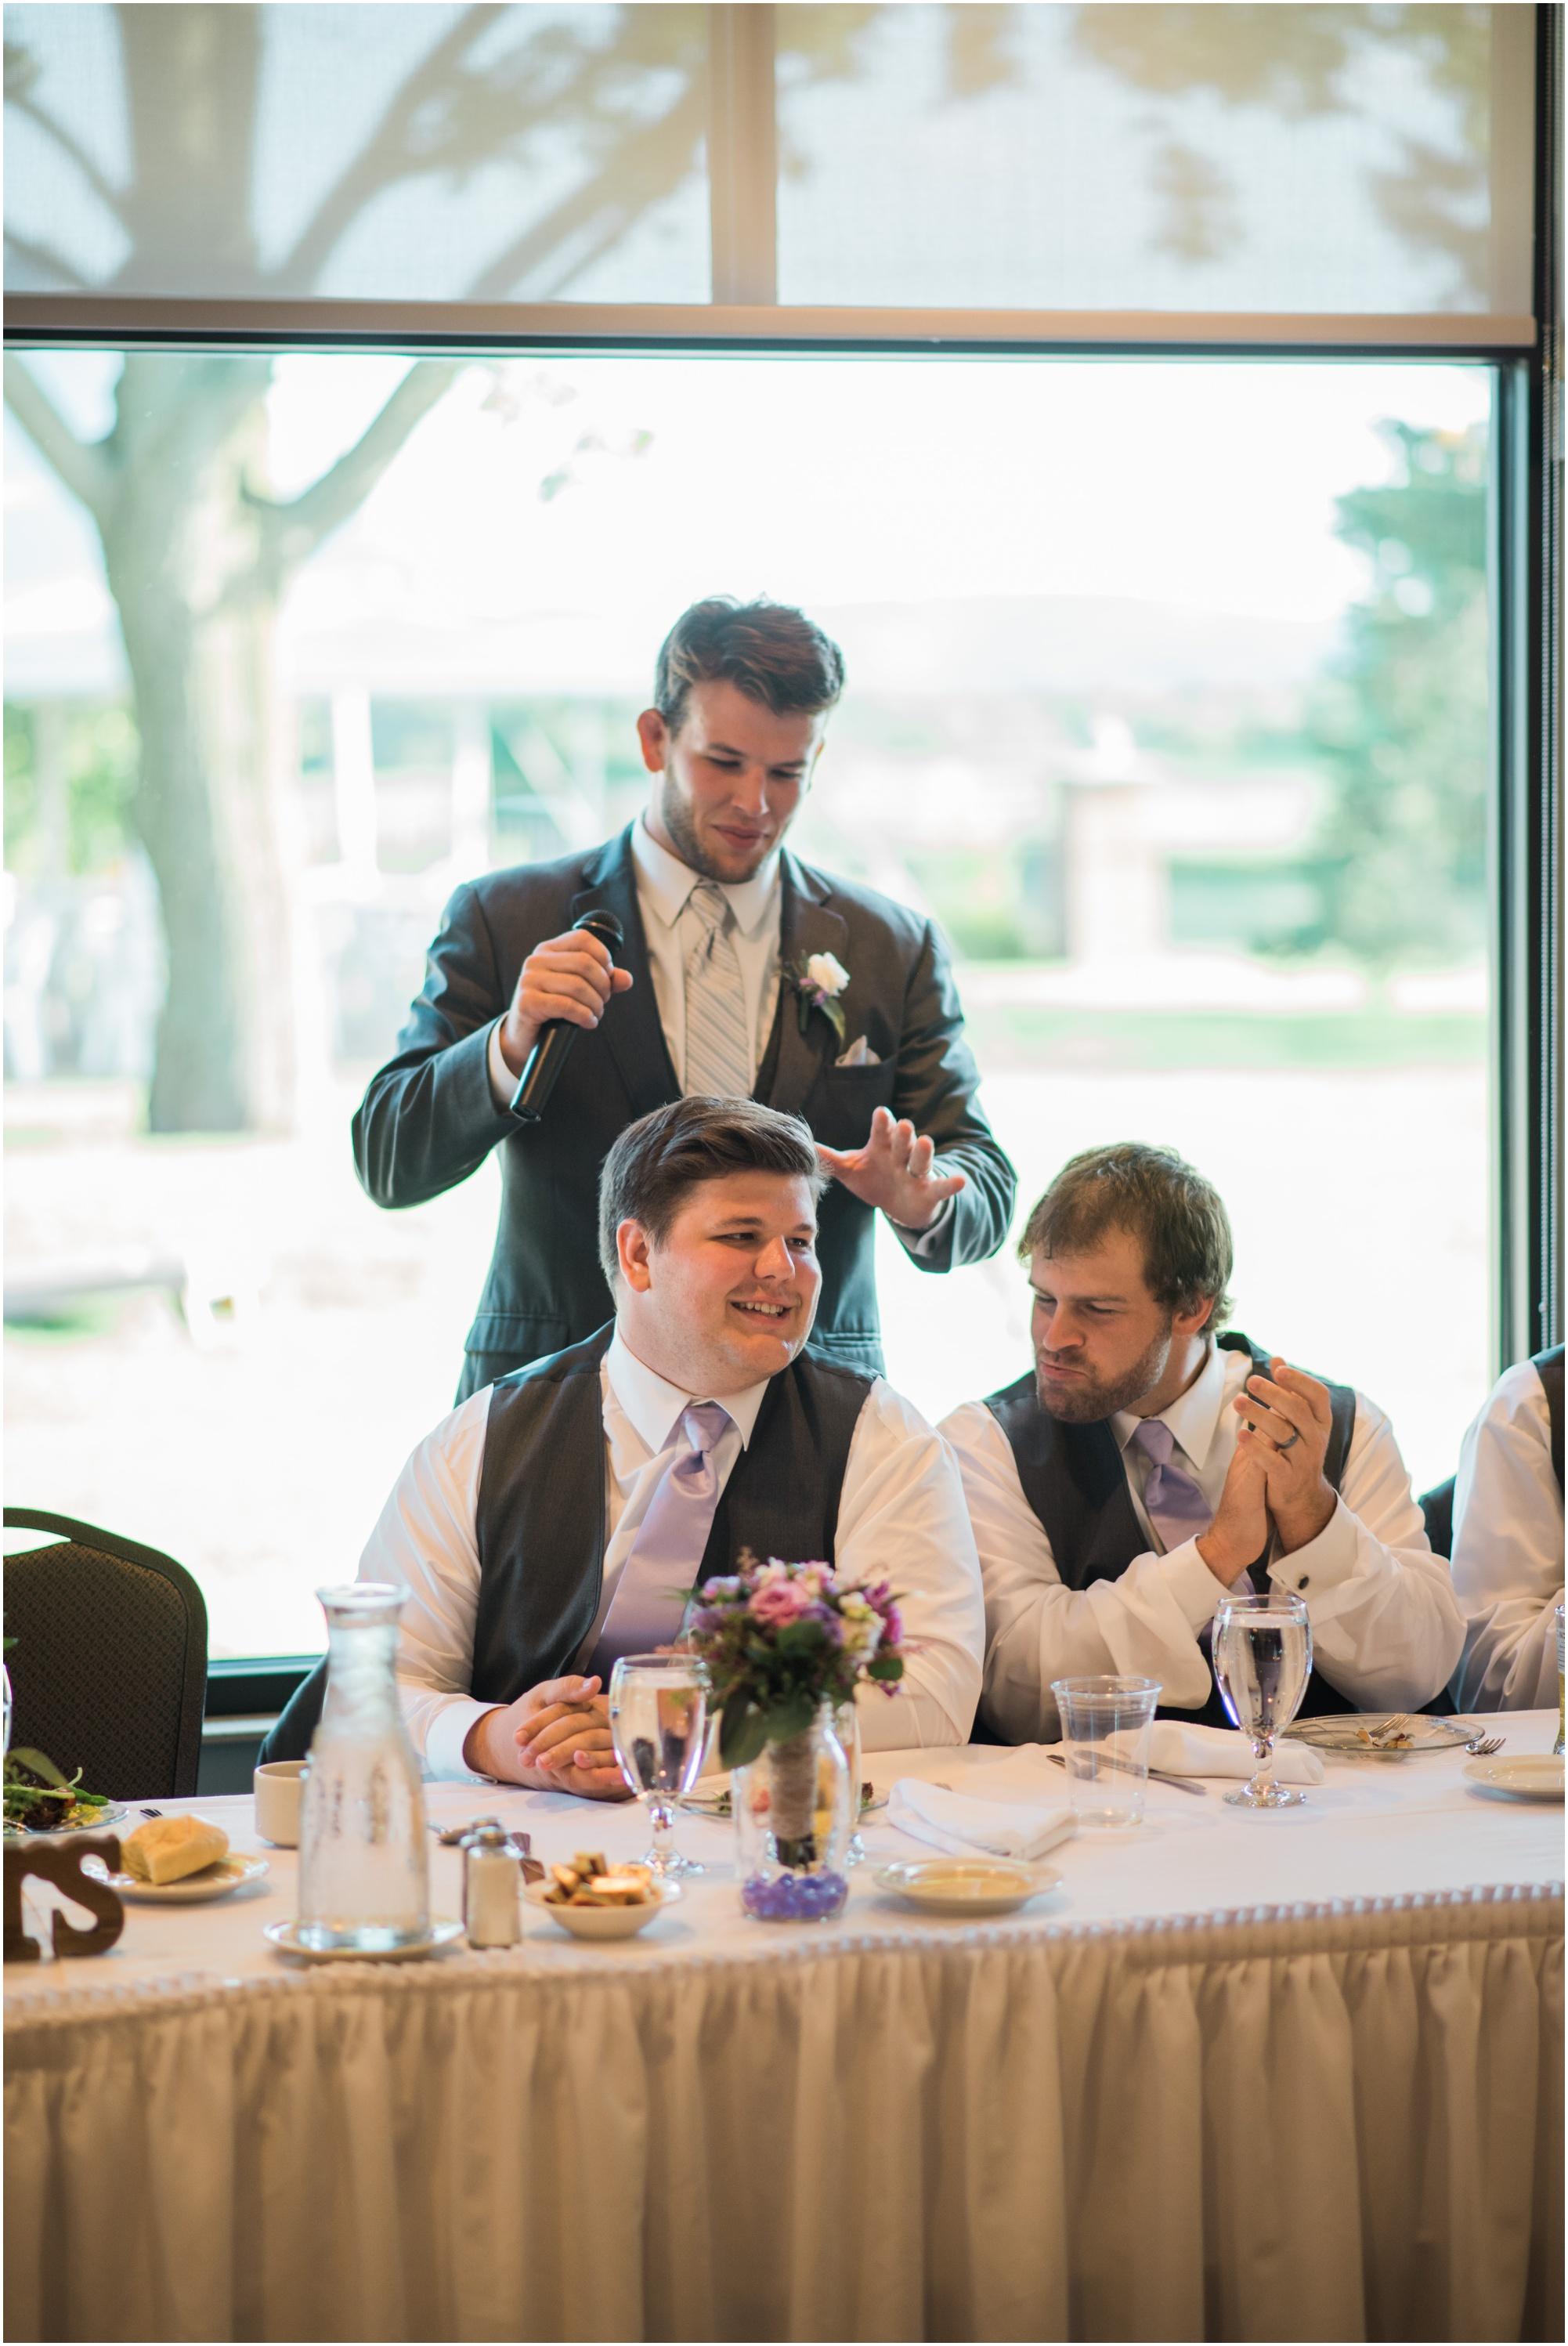 Wisconsin-Wedding-Photographer-Reedsburg-Country-Club-Kaela-and Matt-Wedding-698.jpg